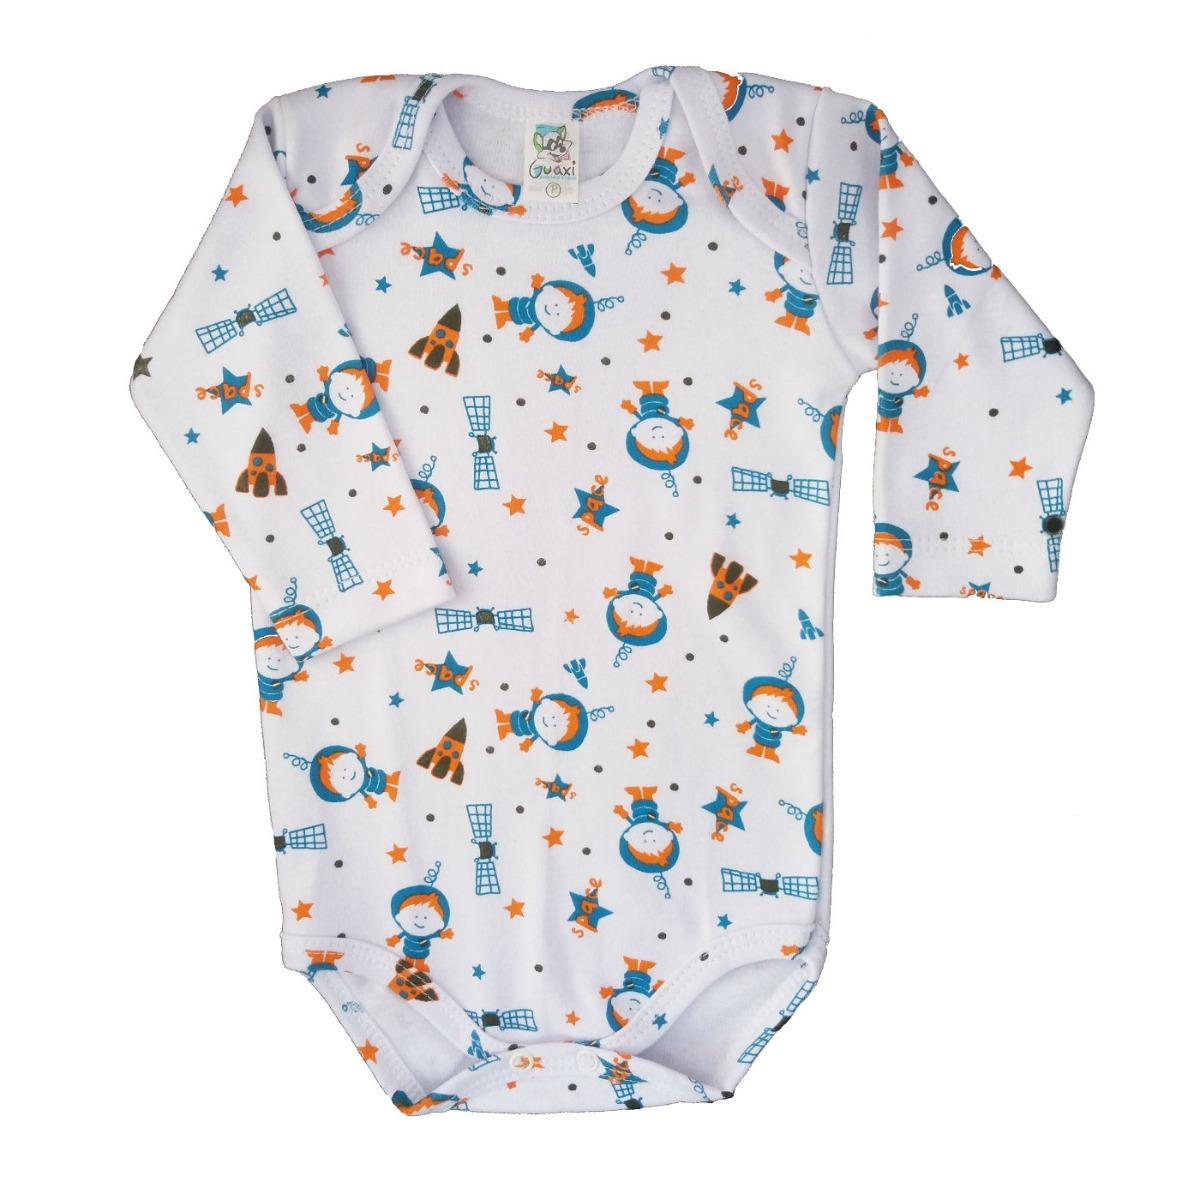 fa2bc0994 Body Para Bebê 1 2 3 Anos Bodies Infantil Manga Longa Boris - R  59 ...